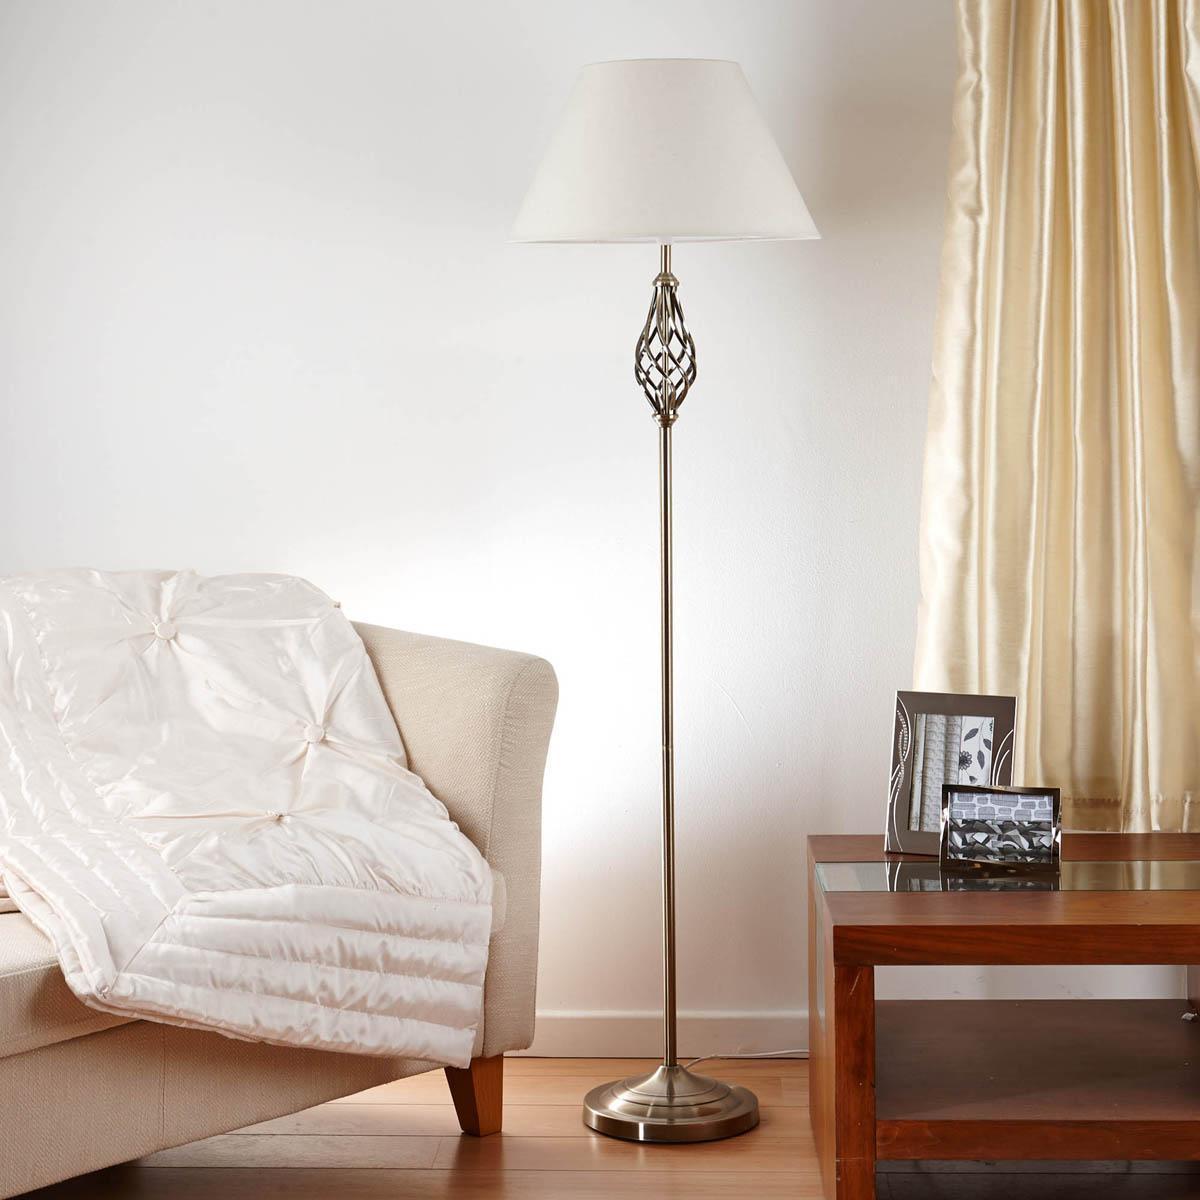 barley twist floor lamp antique brass cheap prices uk delivery. Black Bedroom Furniture Sets. Home Design Ideas